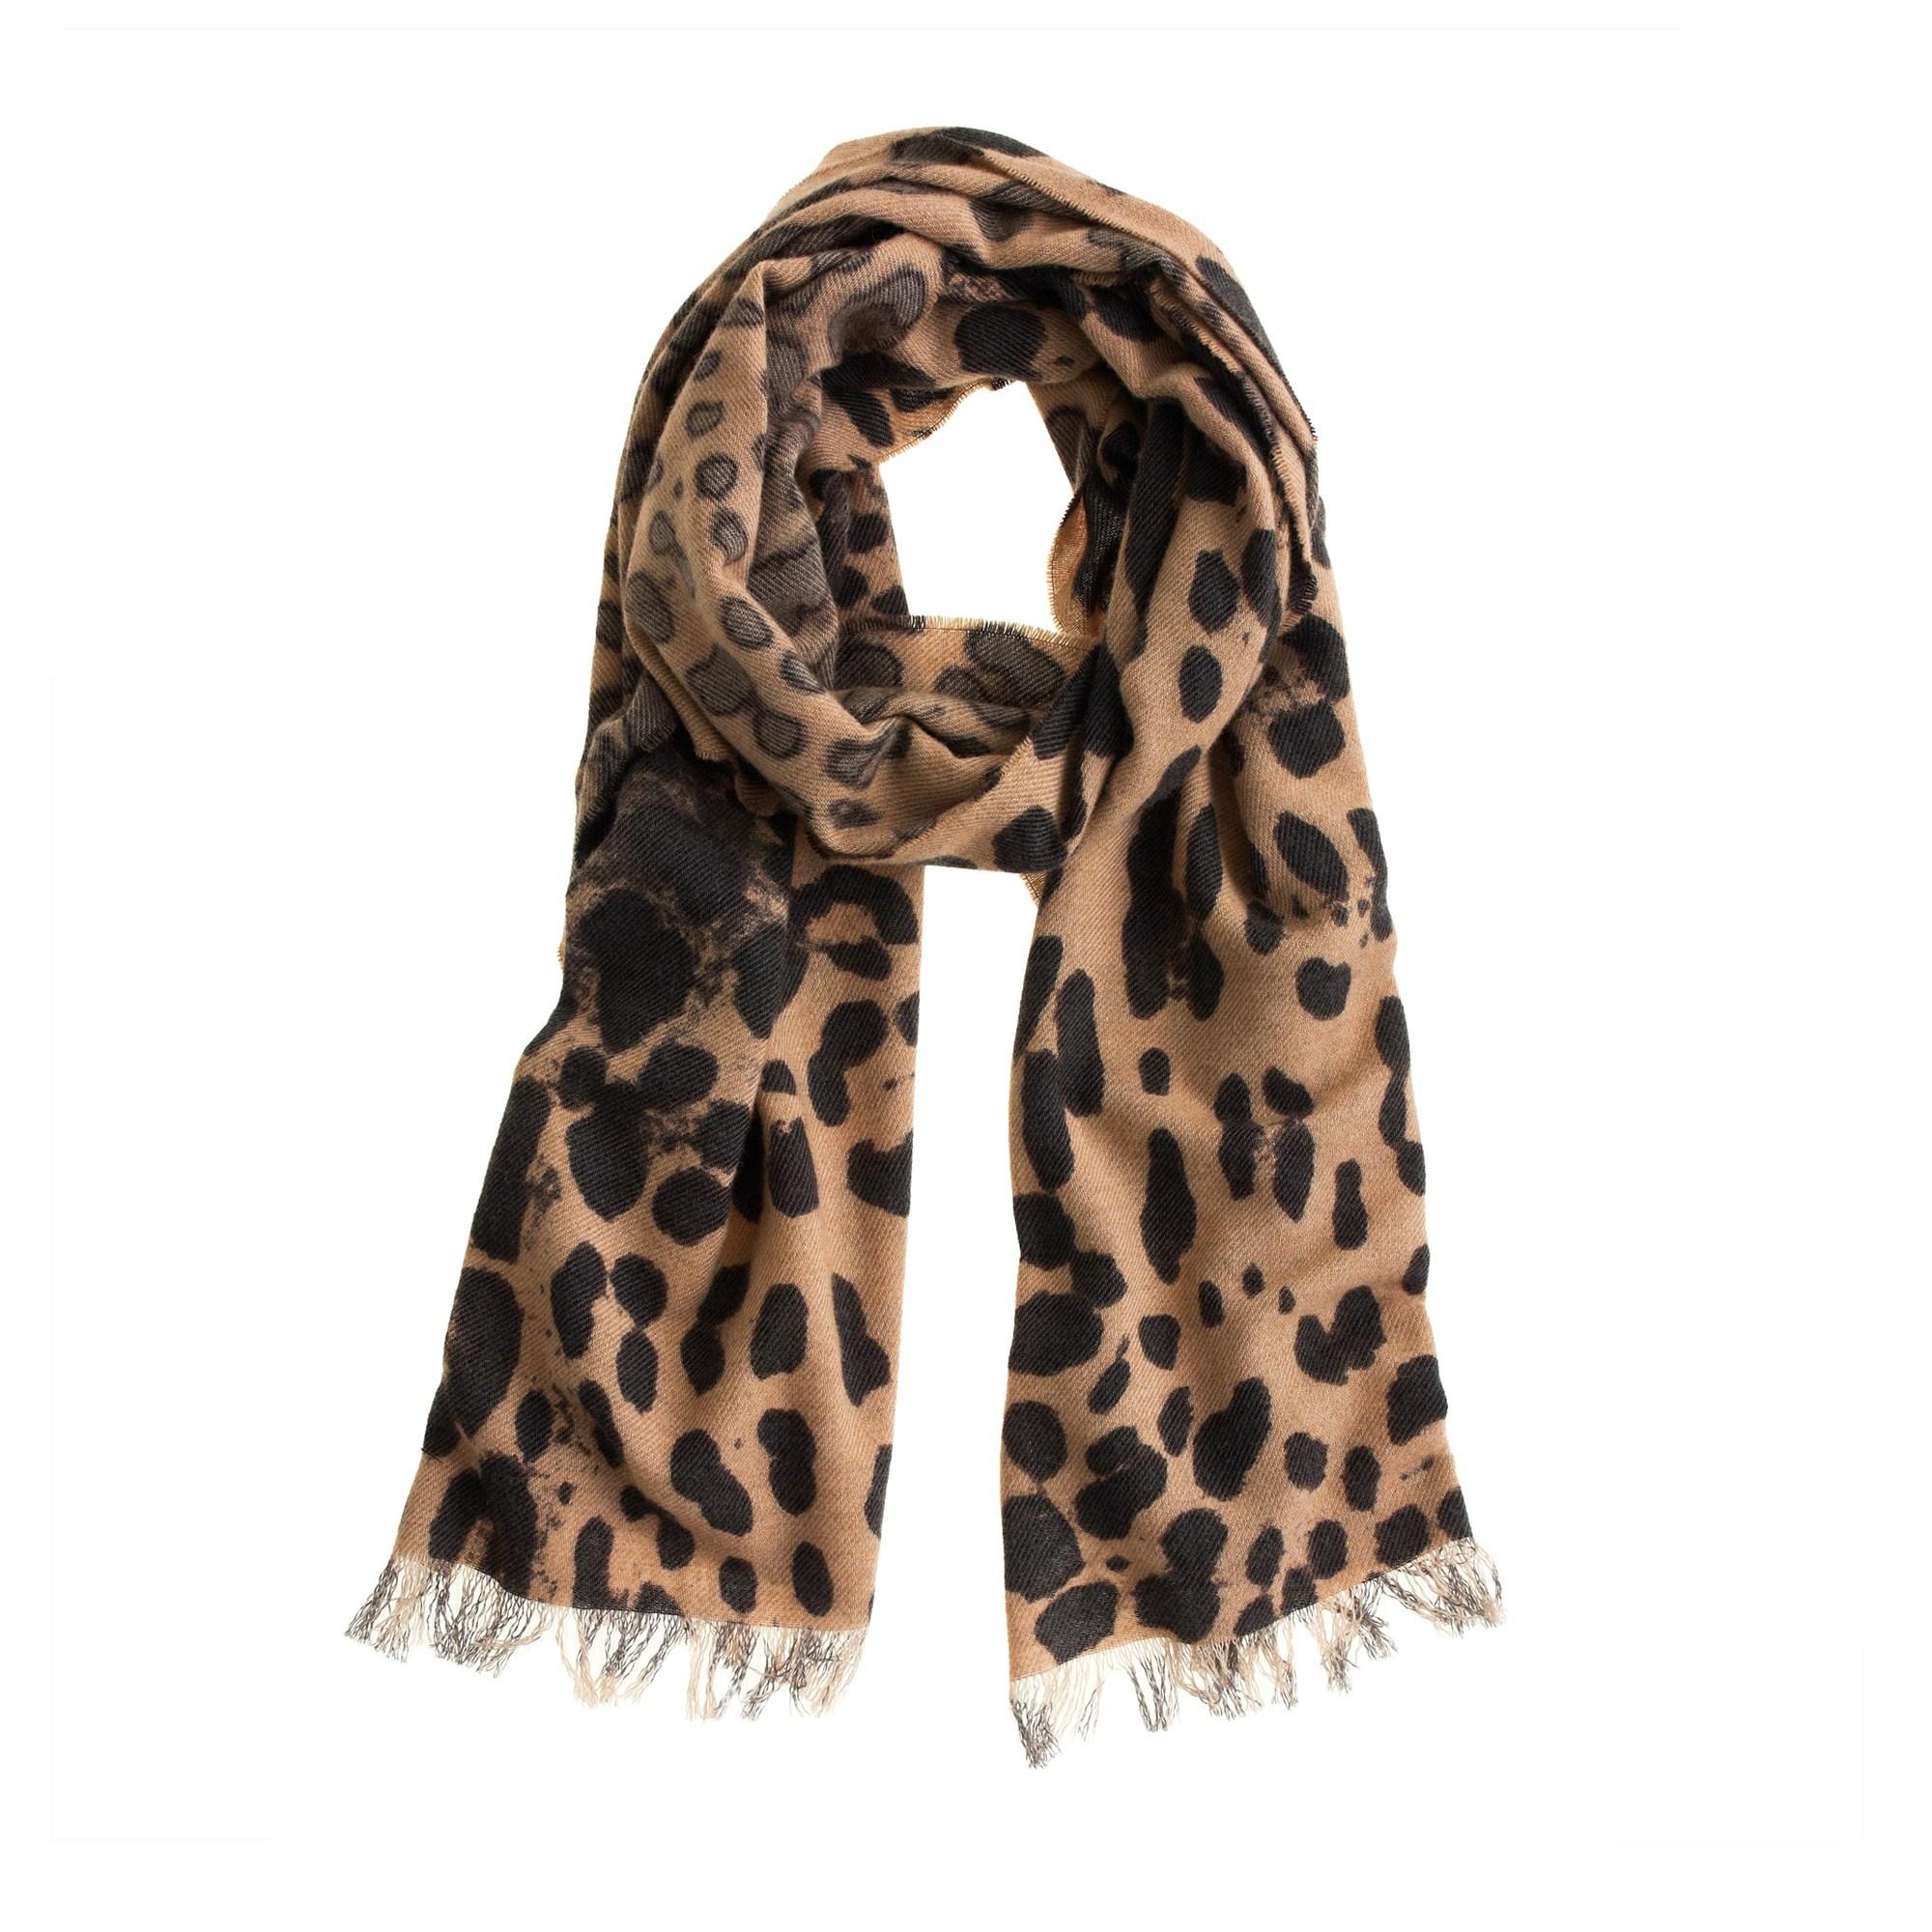 Leopard scarf : | J.Crew